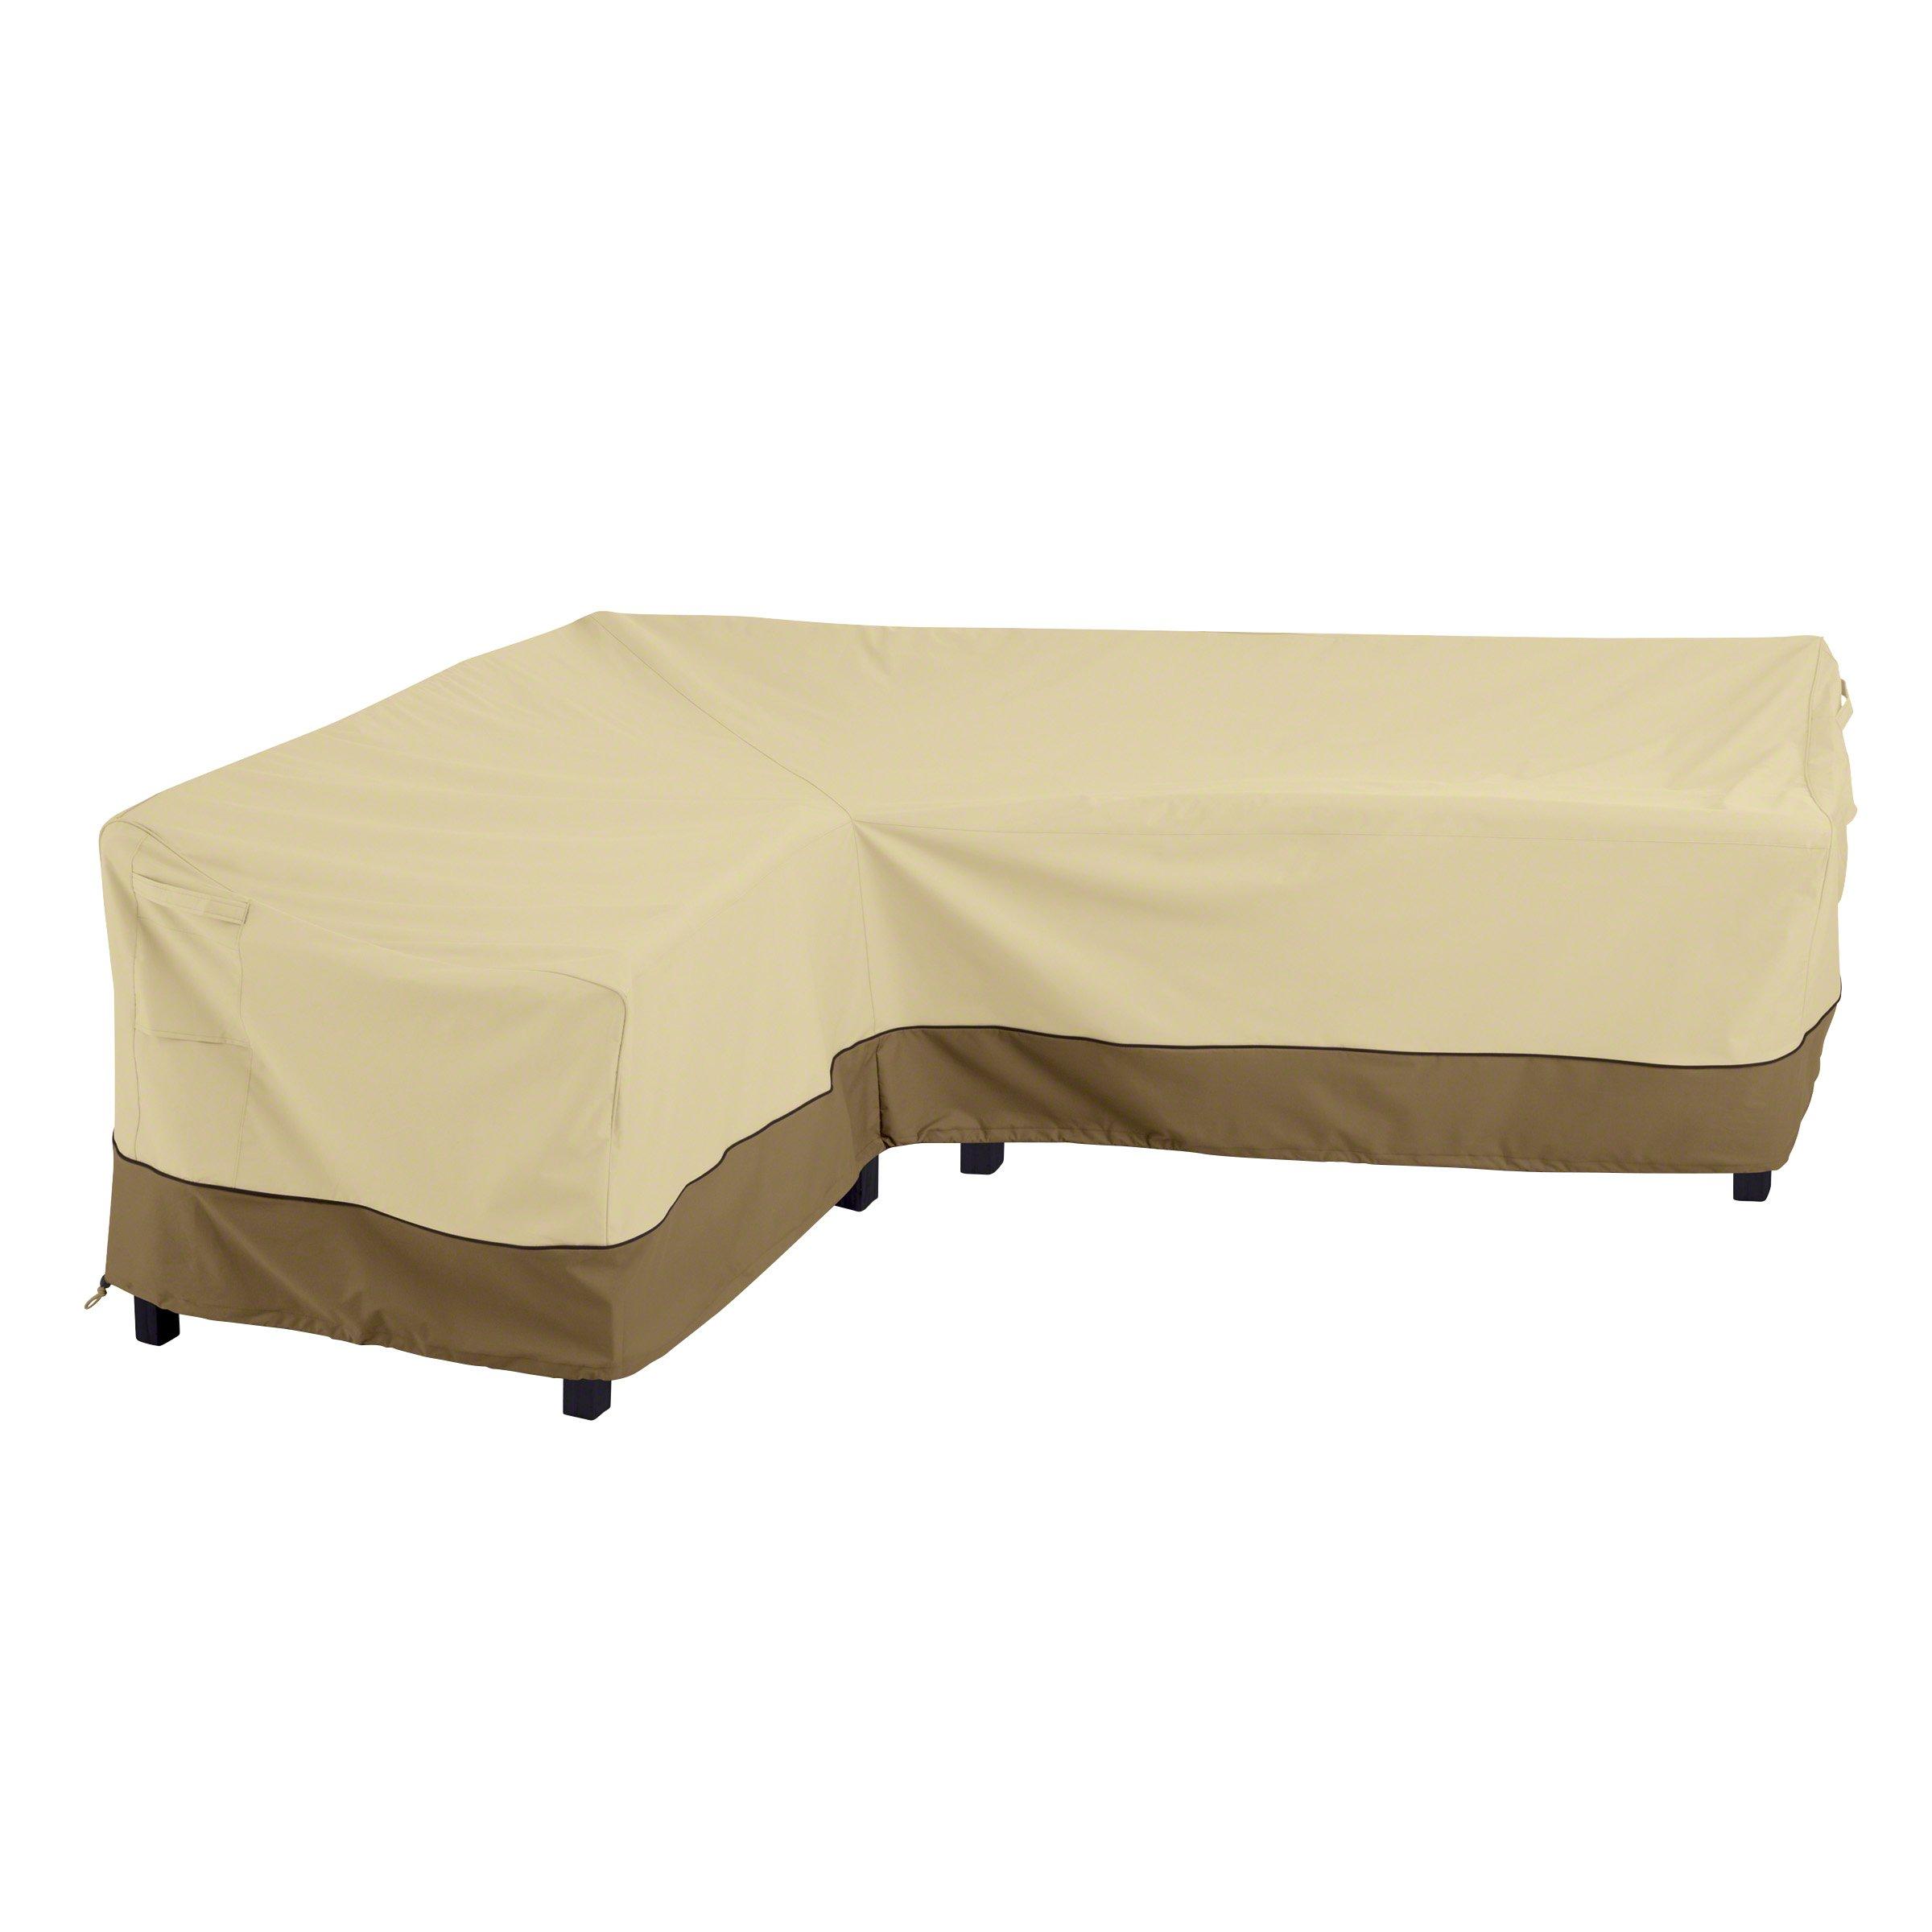 Classic Accessories 55-881-011501-RT Veranda Patio L-Shaped Sectional Sofa Cover, Left Facing